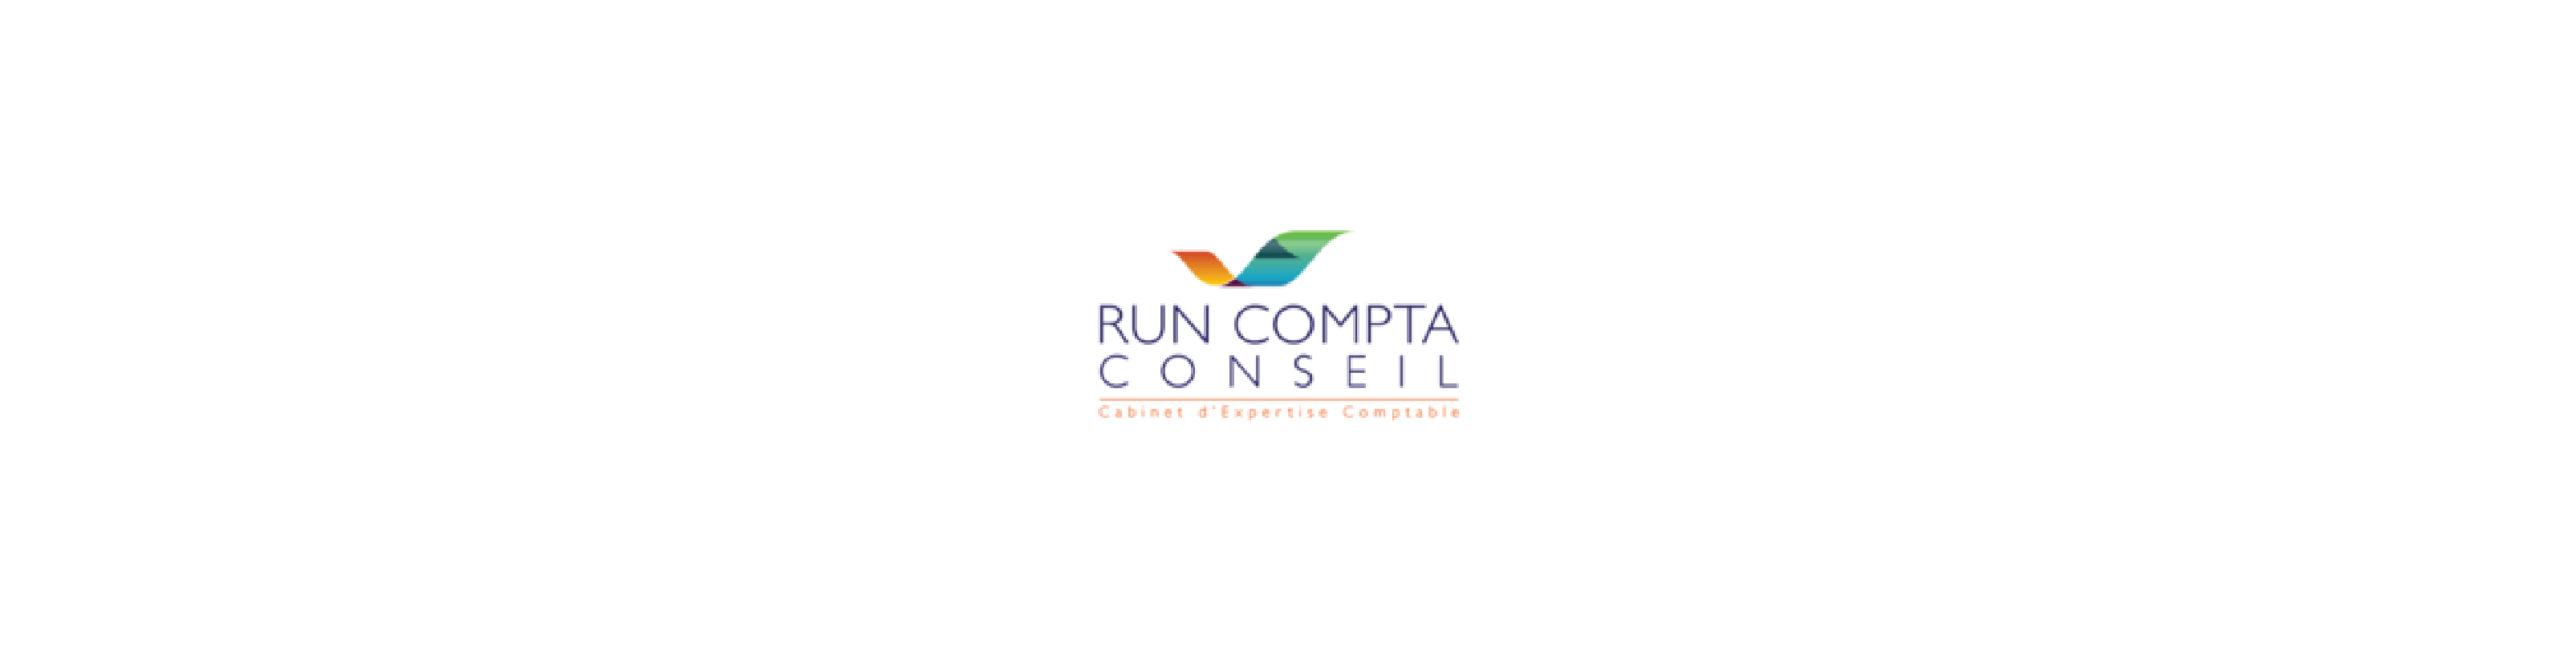 runcompta-logo-01